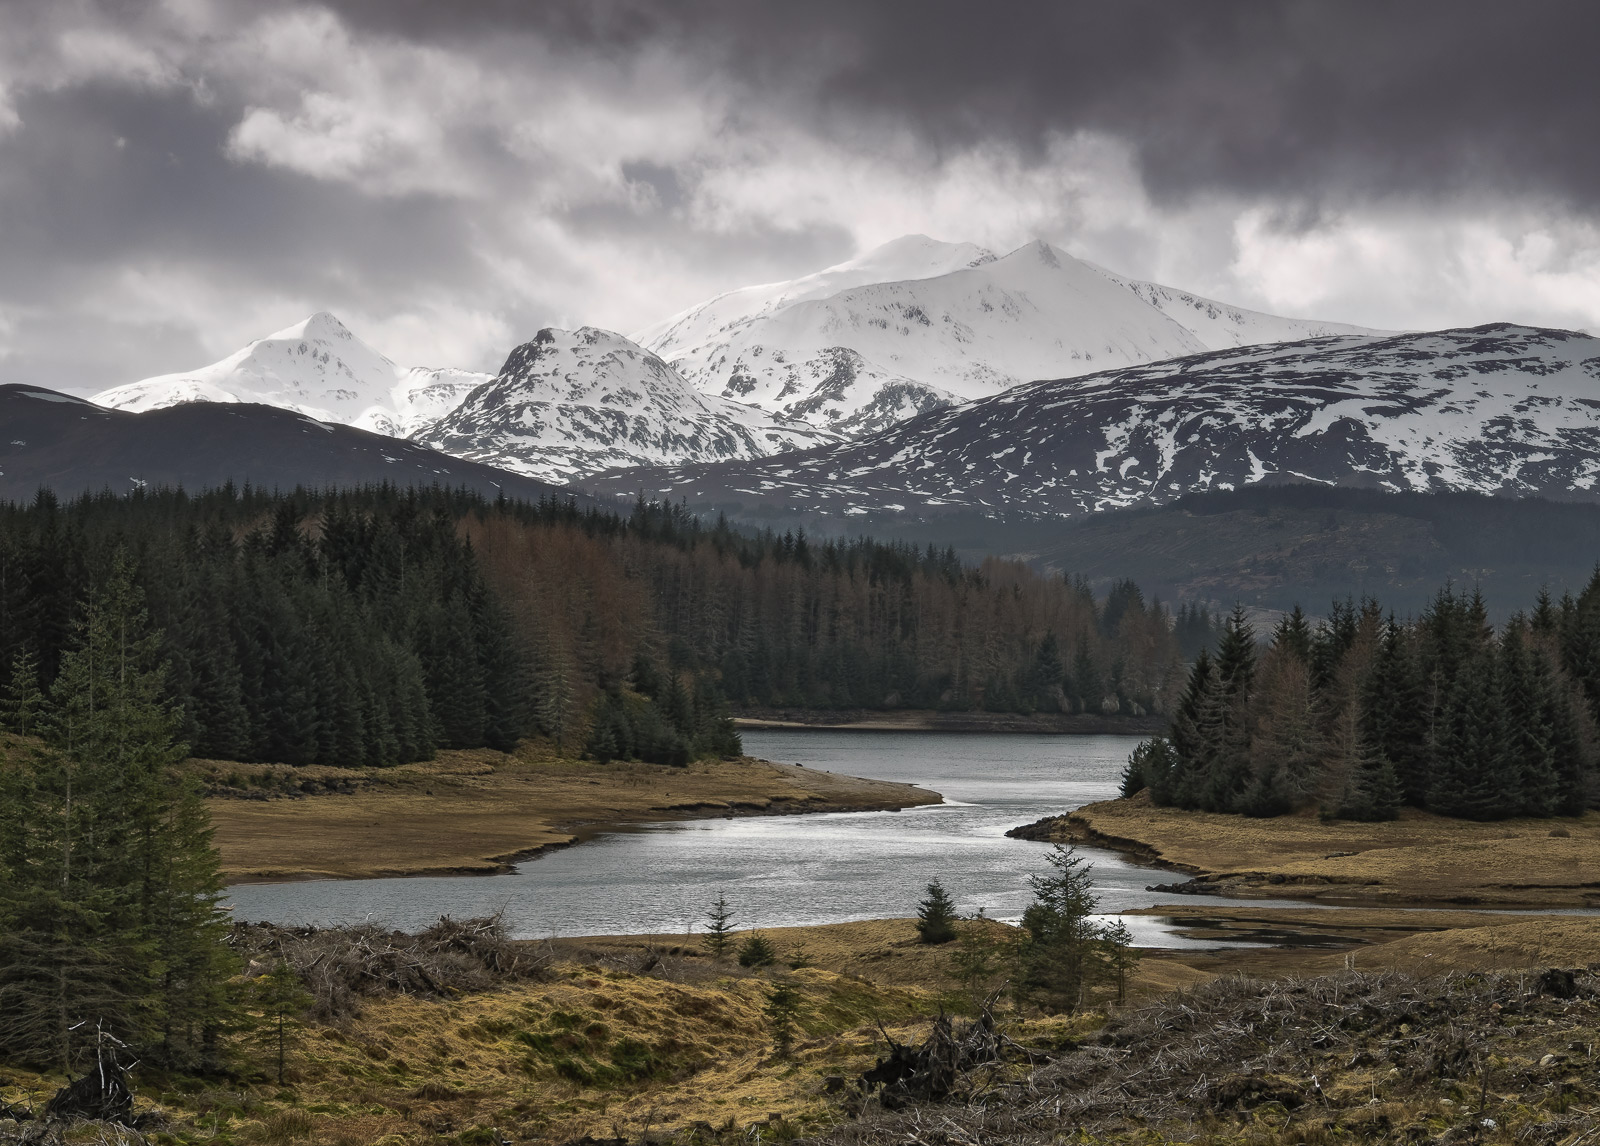 Lochaber View, Glen Spean, Highlands, Scotland, snow, peaks, Laggan, epic, silvery, light, larch, pine, summit, sunlight, photo